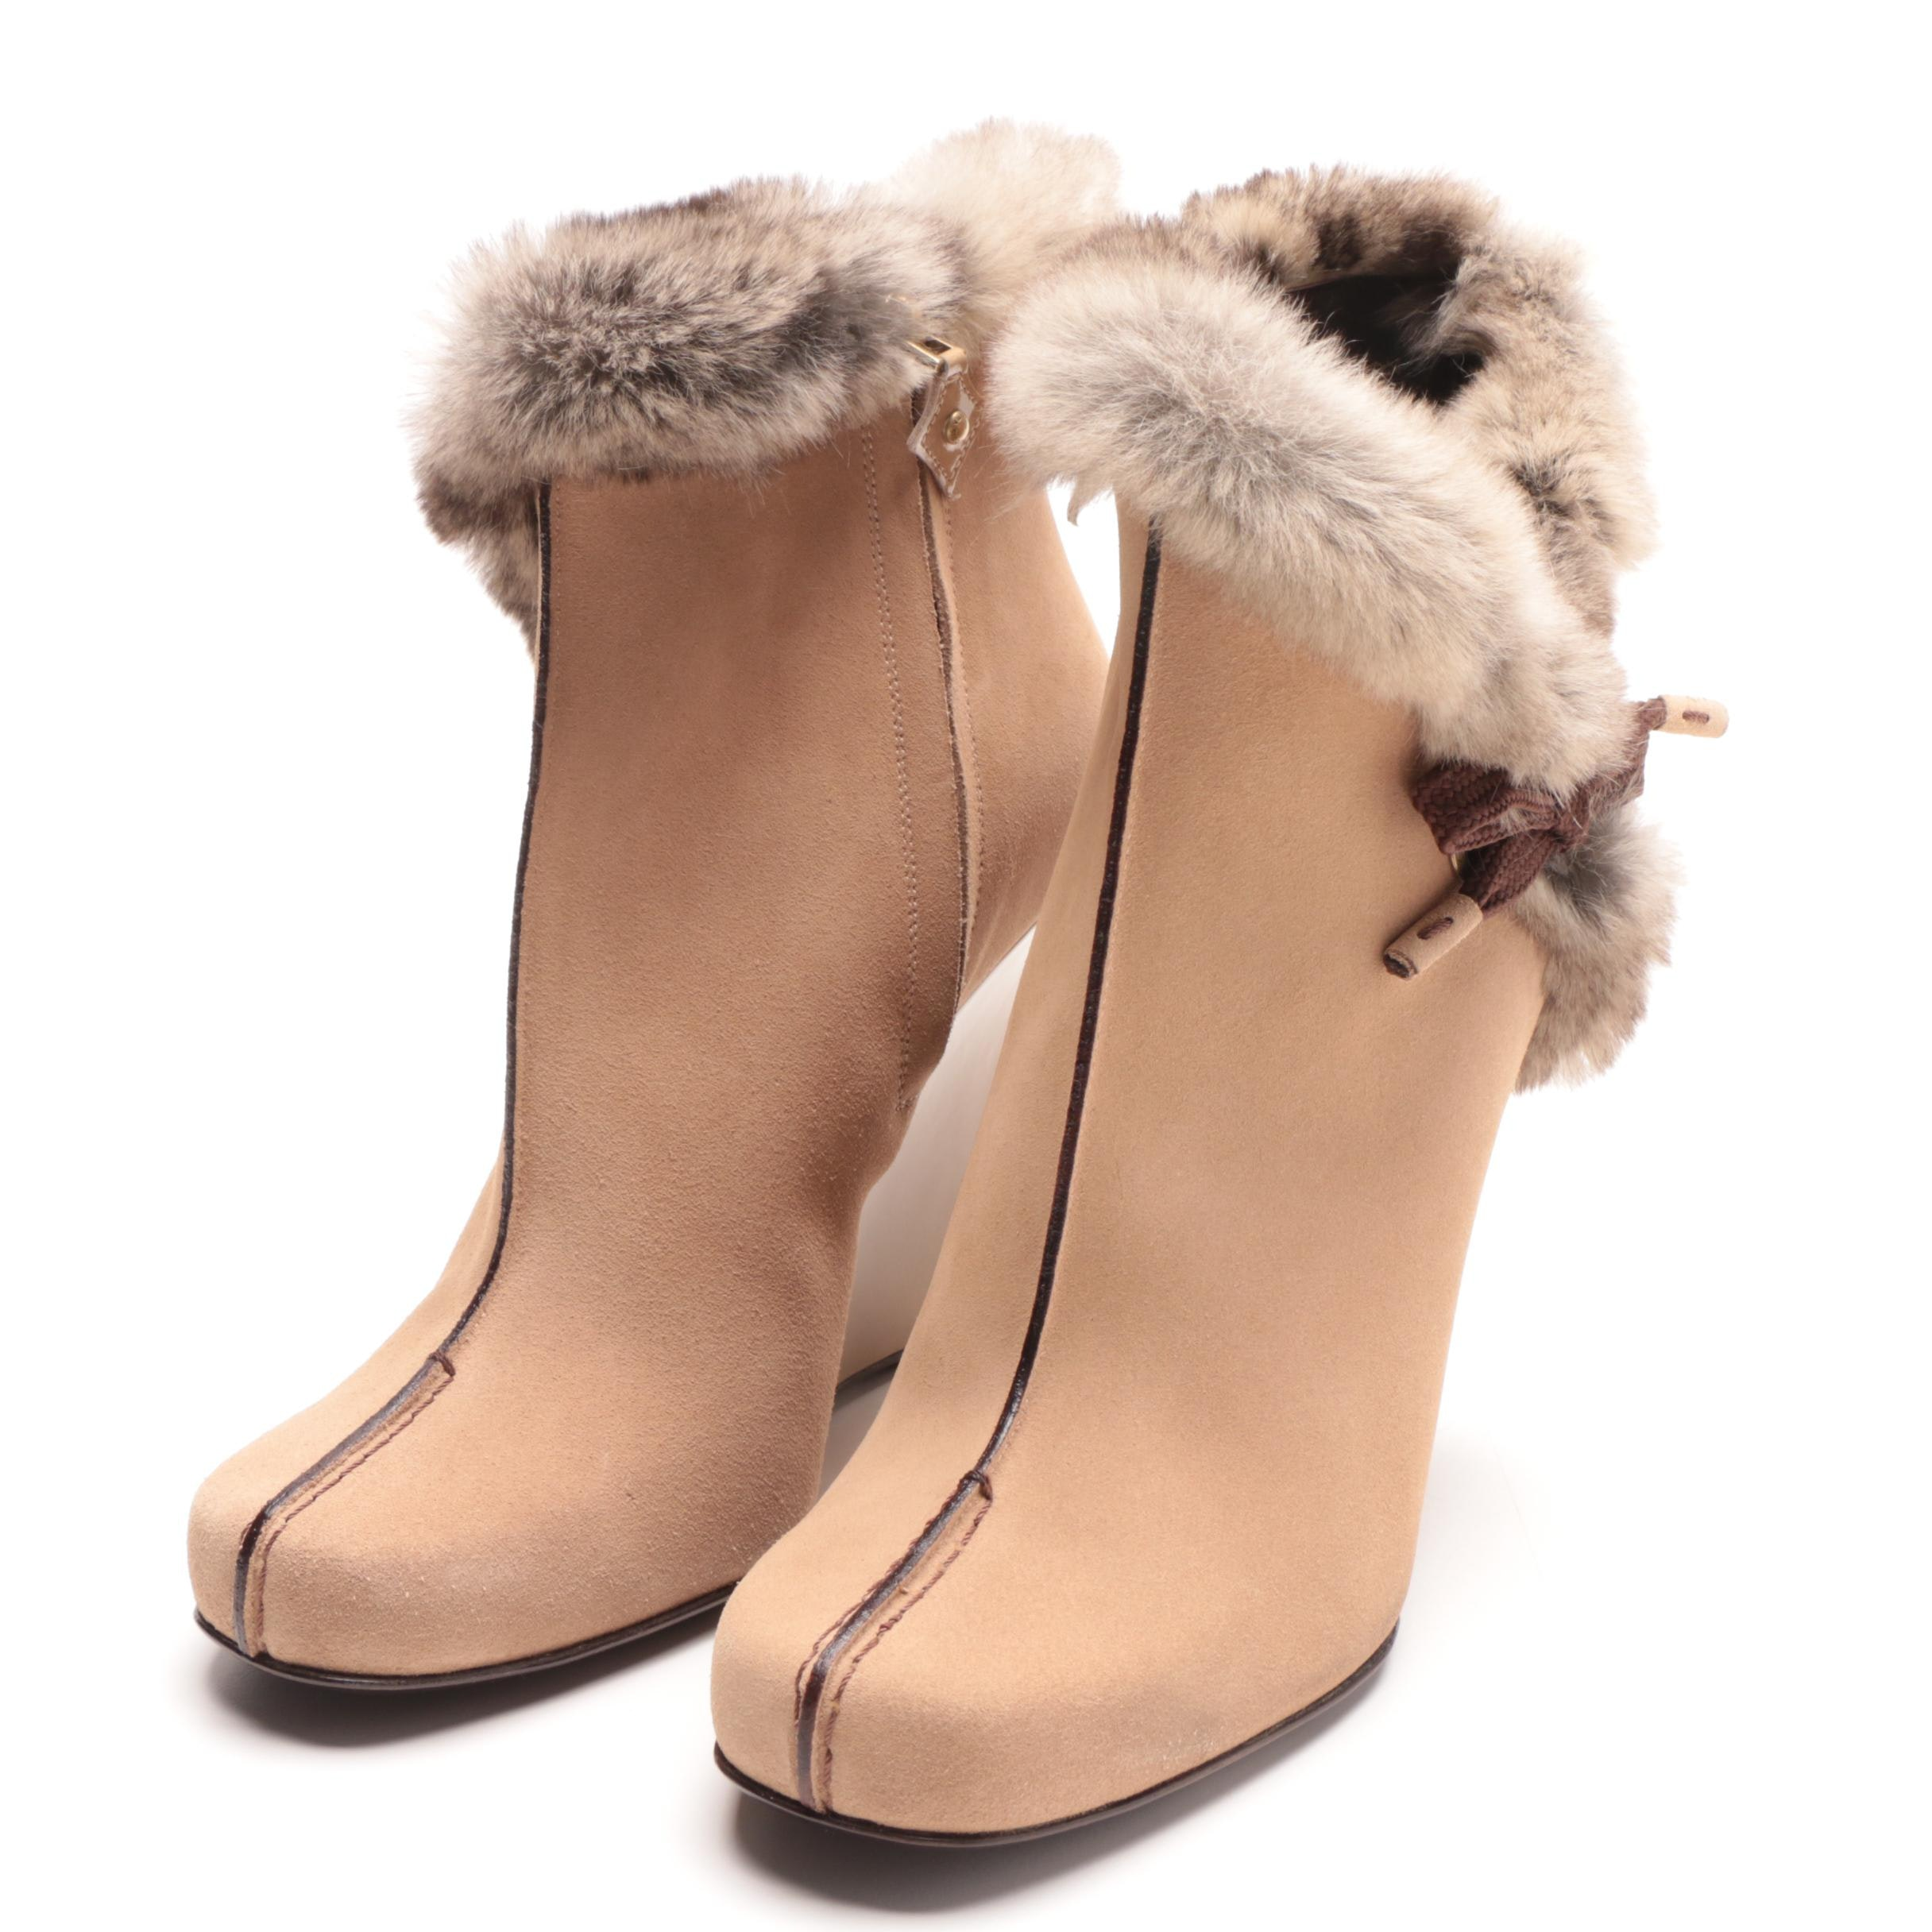 Louis Vuitton Tan Suede Fur Trimmed Wedge Booties